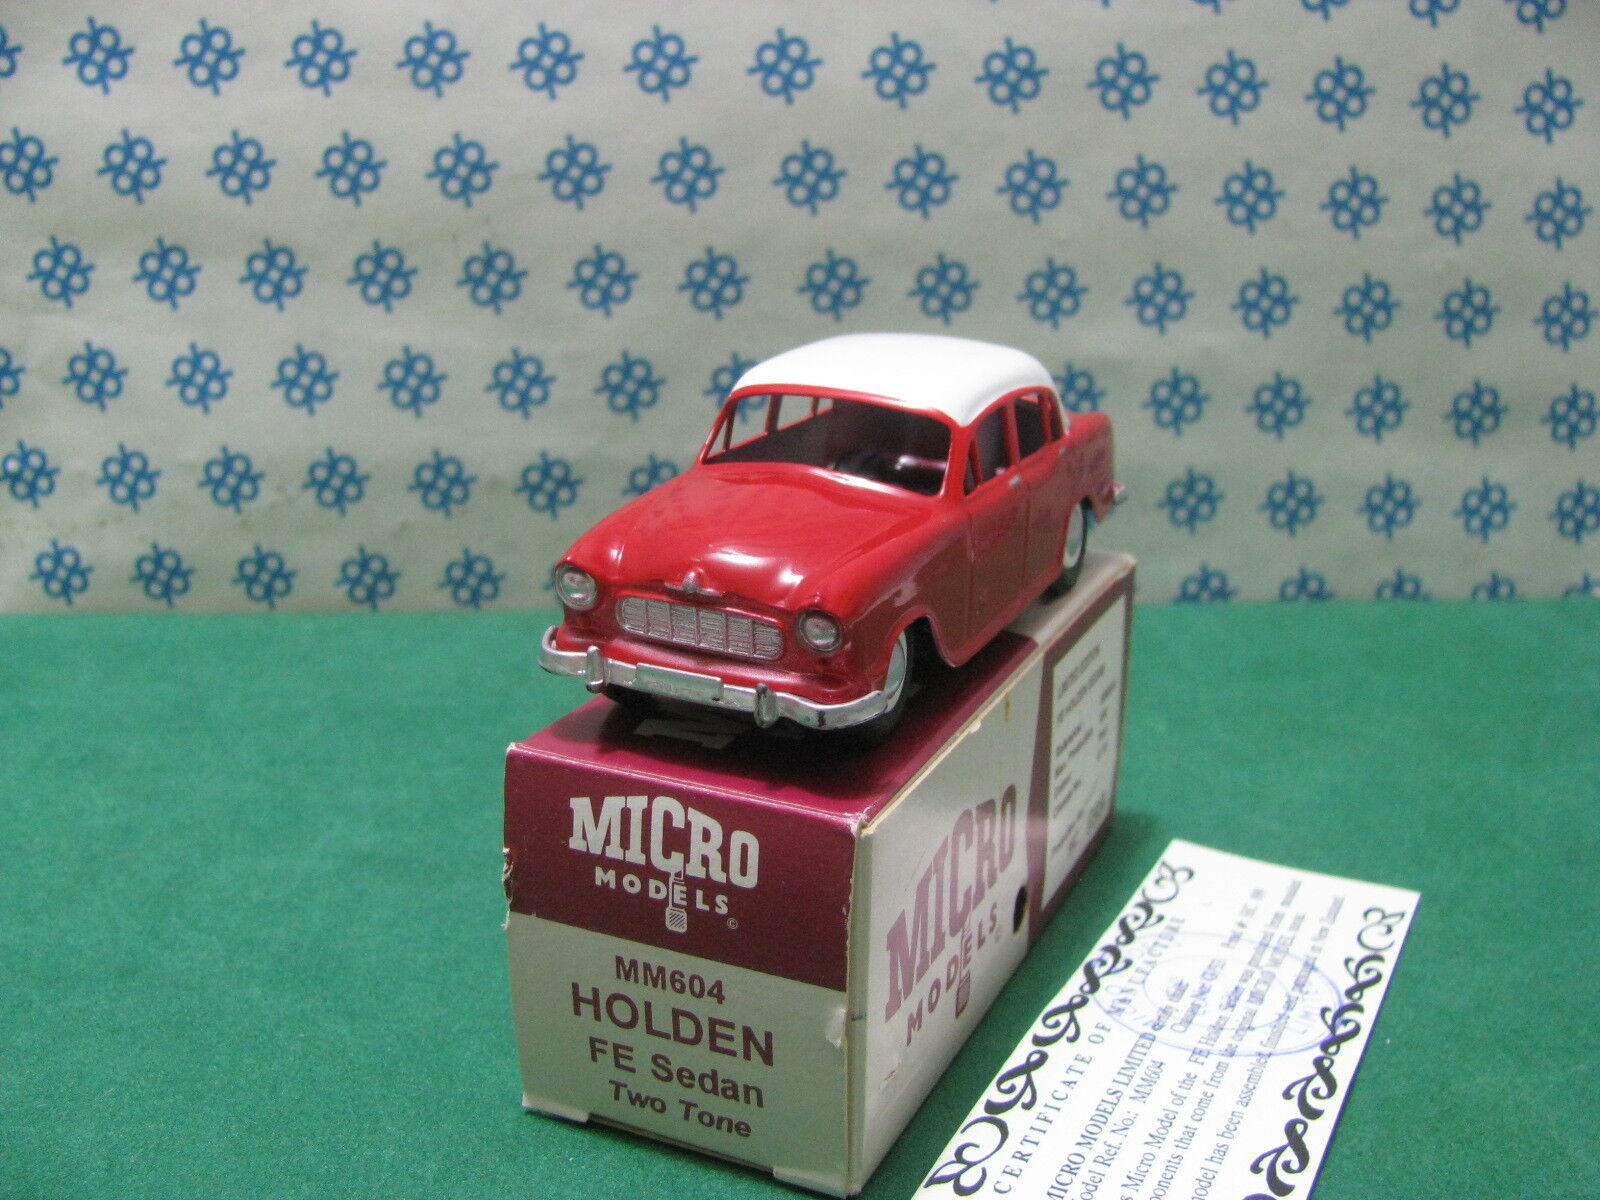 Vintage micro Models-Holden fe sedan biColoreee mm604-MIB